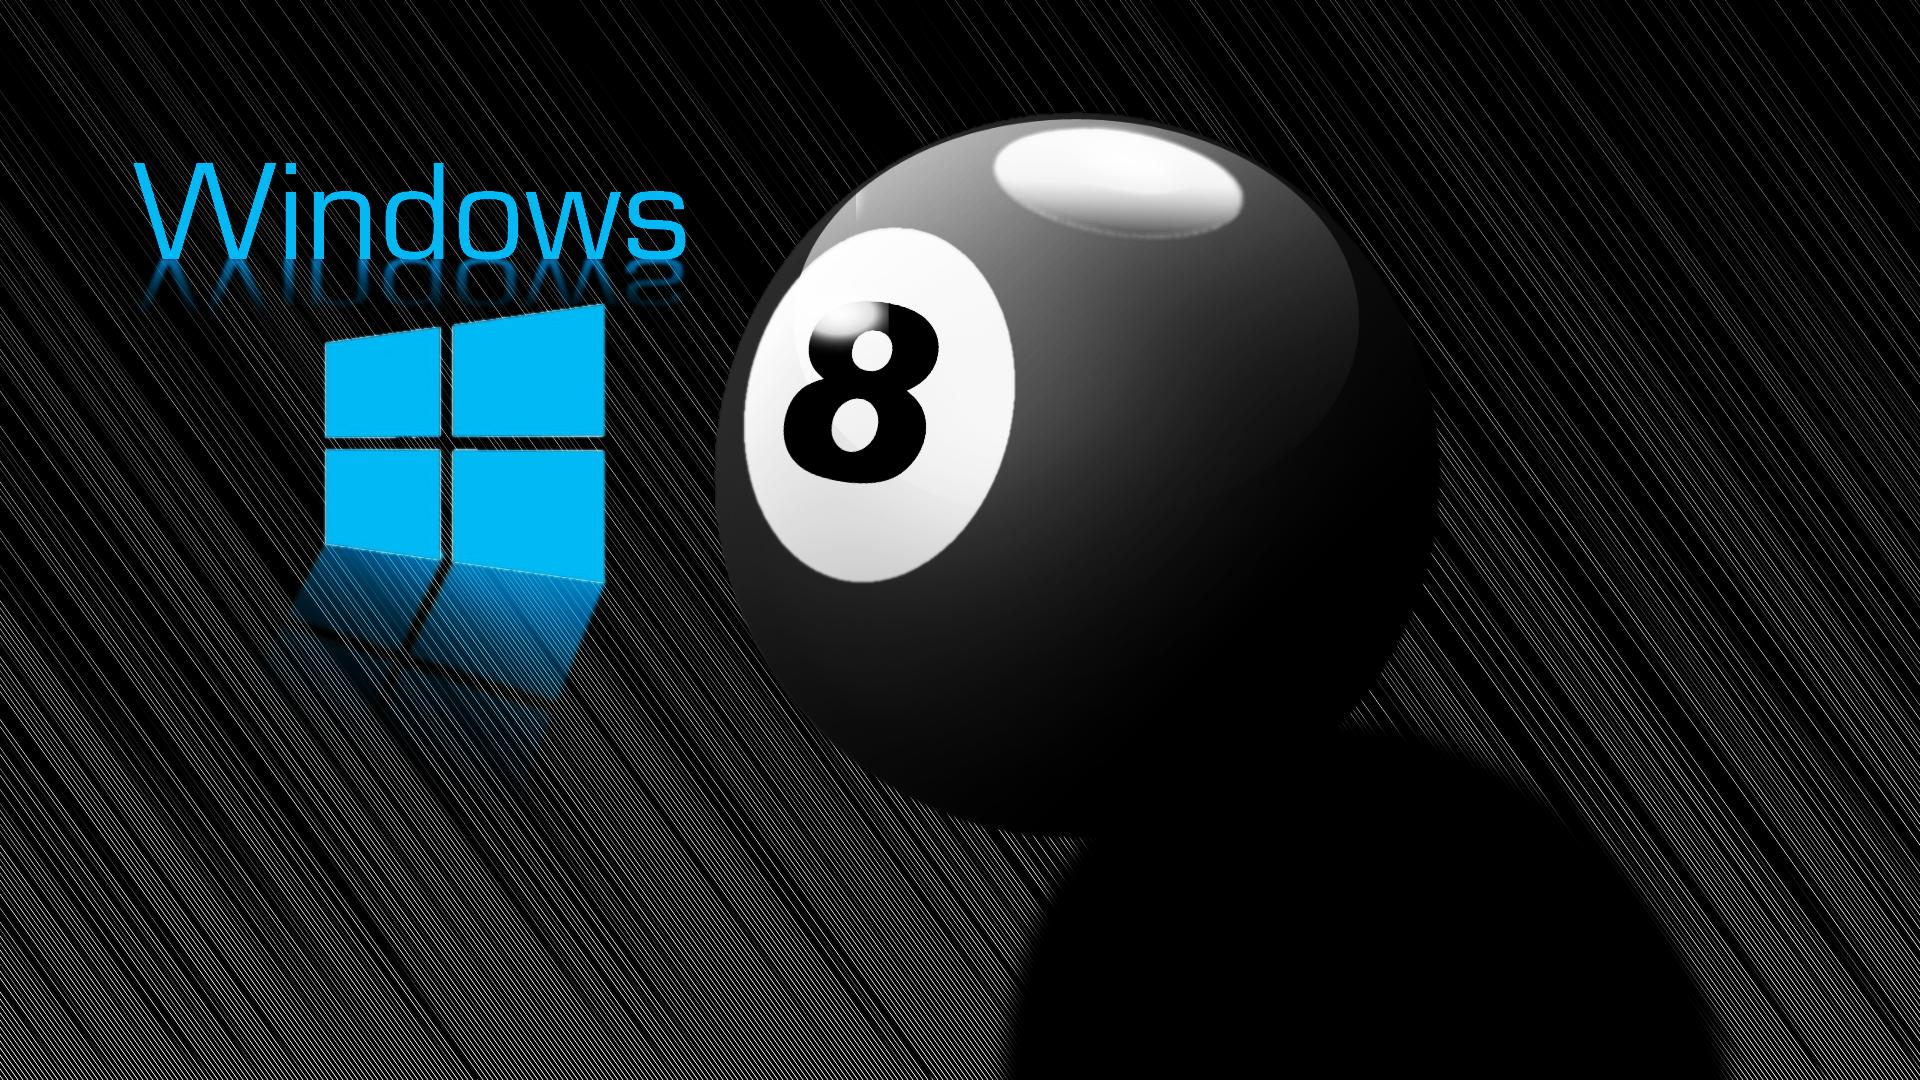 Windows 8 Full Hd Wallpapers 19201080 135435 HD Wallpaper Res 1920x1080